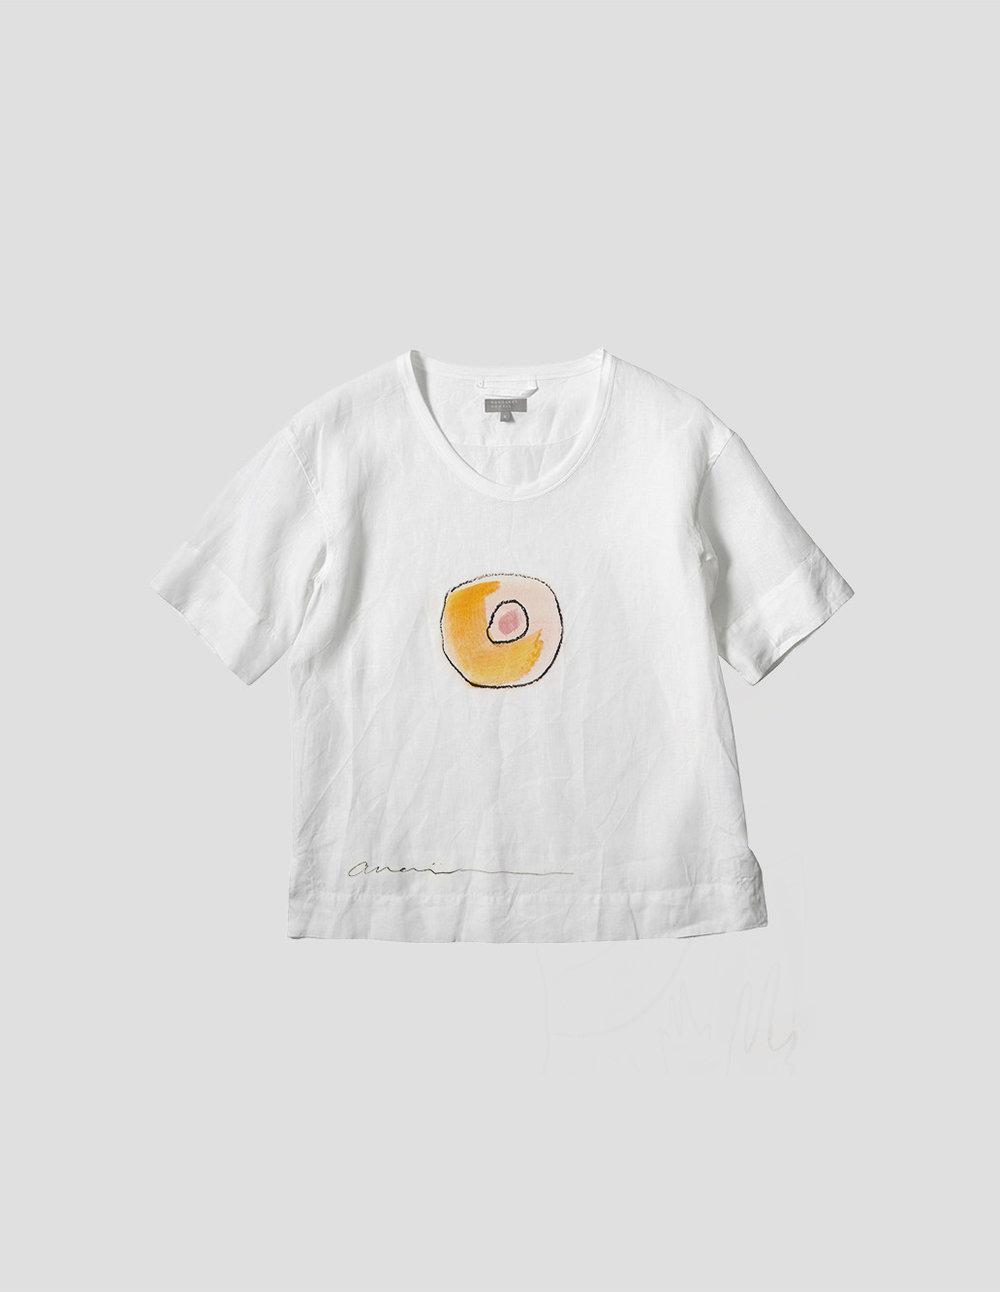 Whiteshirt_Circle.jpg